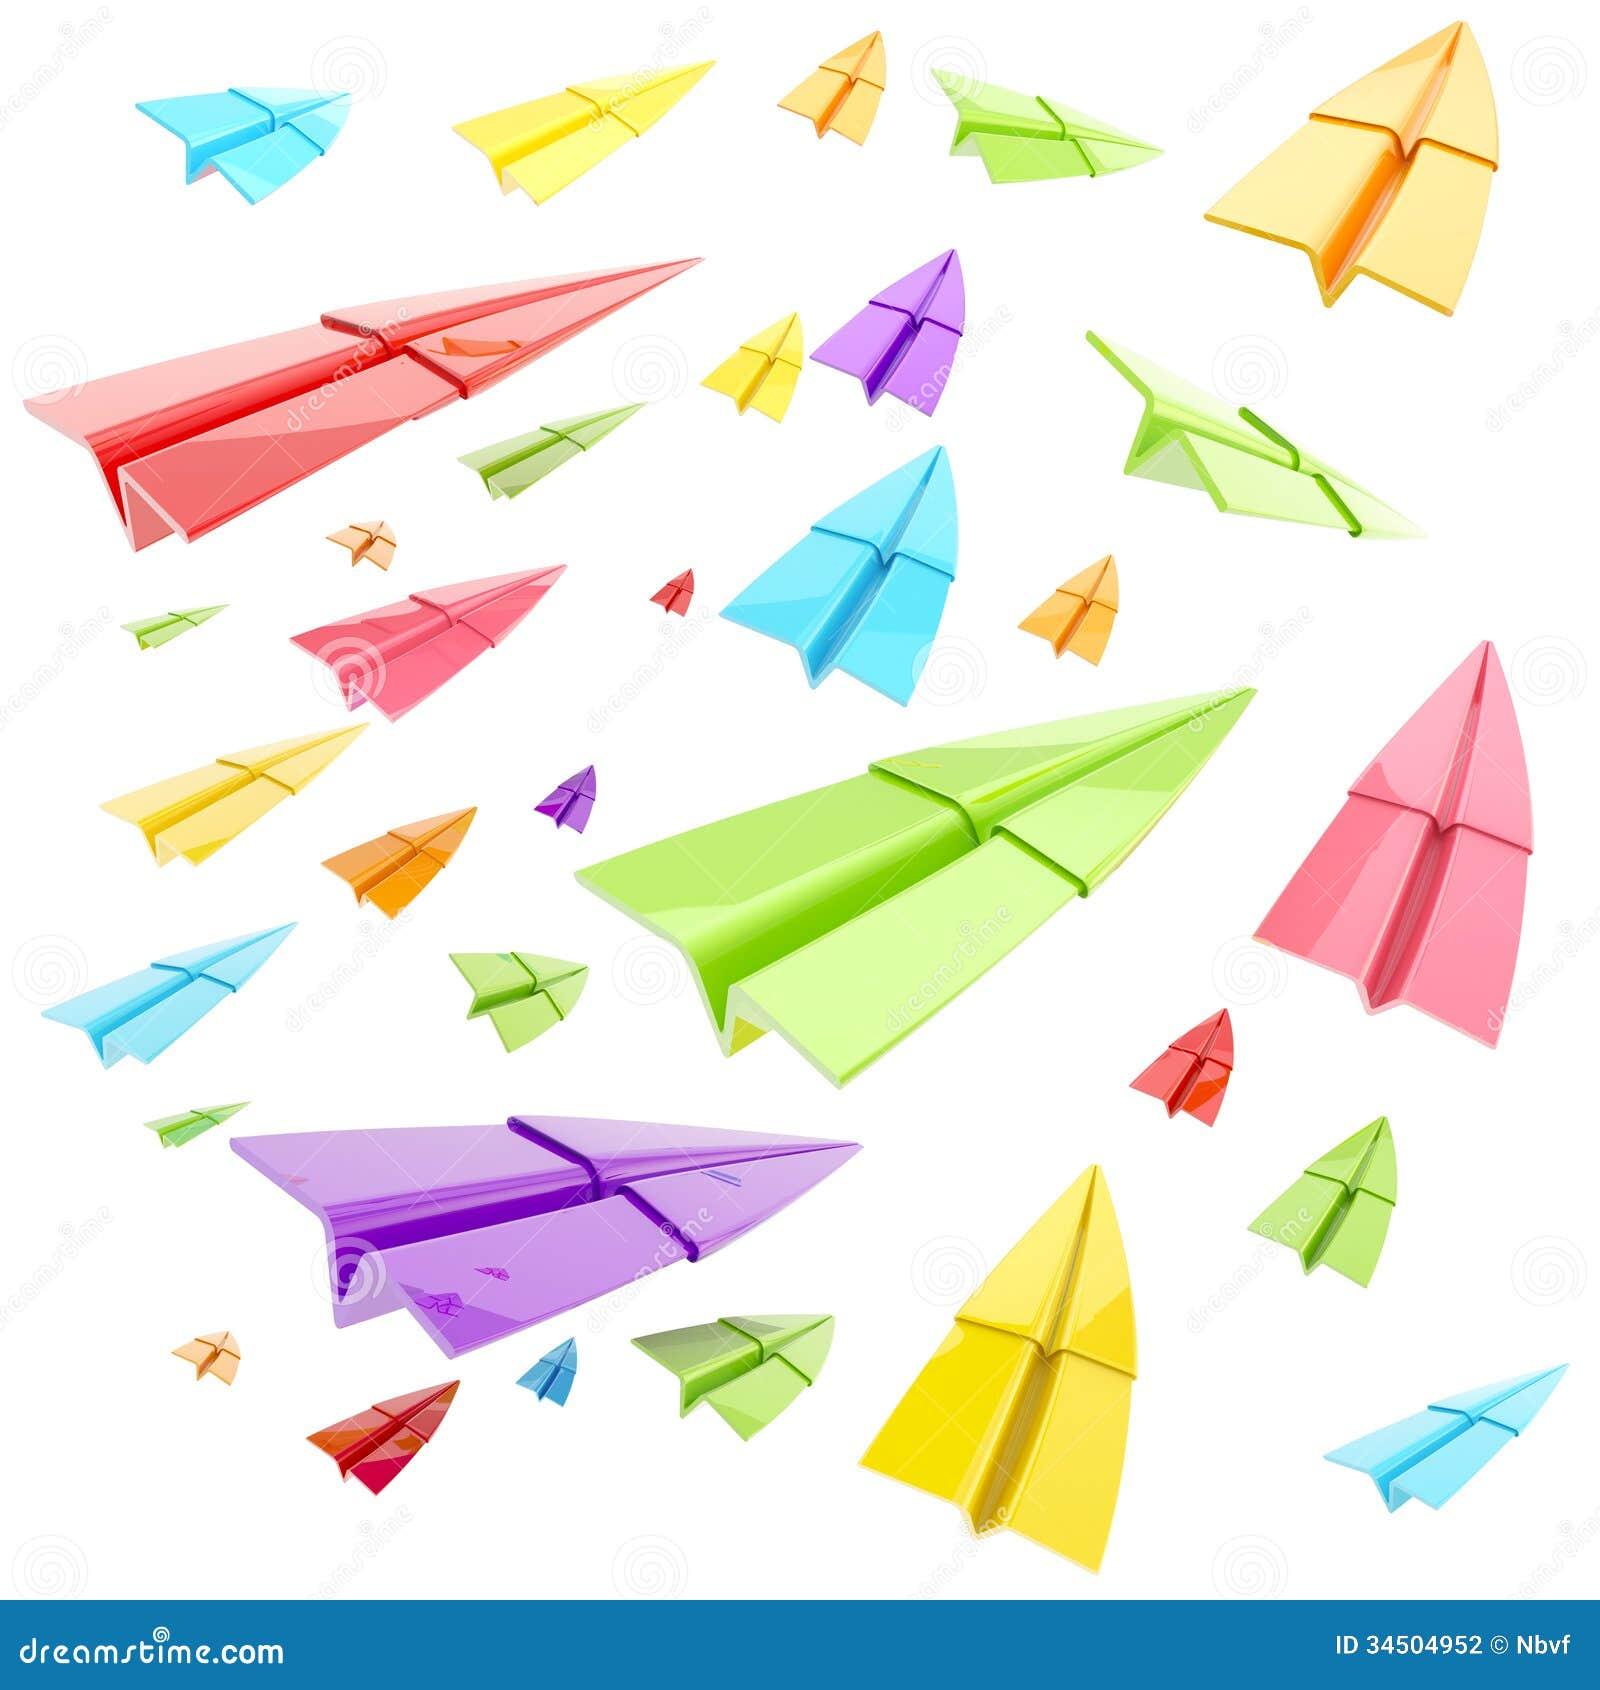 paper plane stock illustration - photo #5